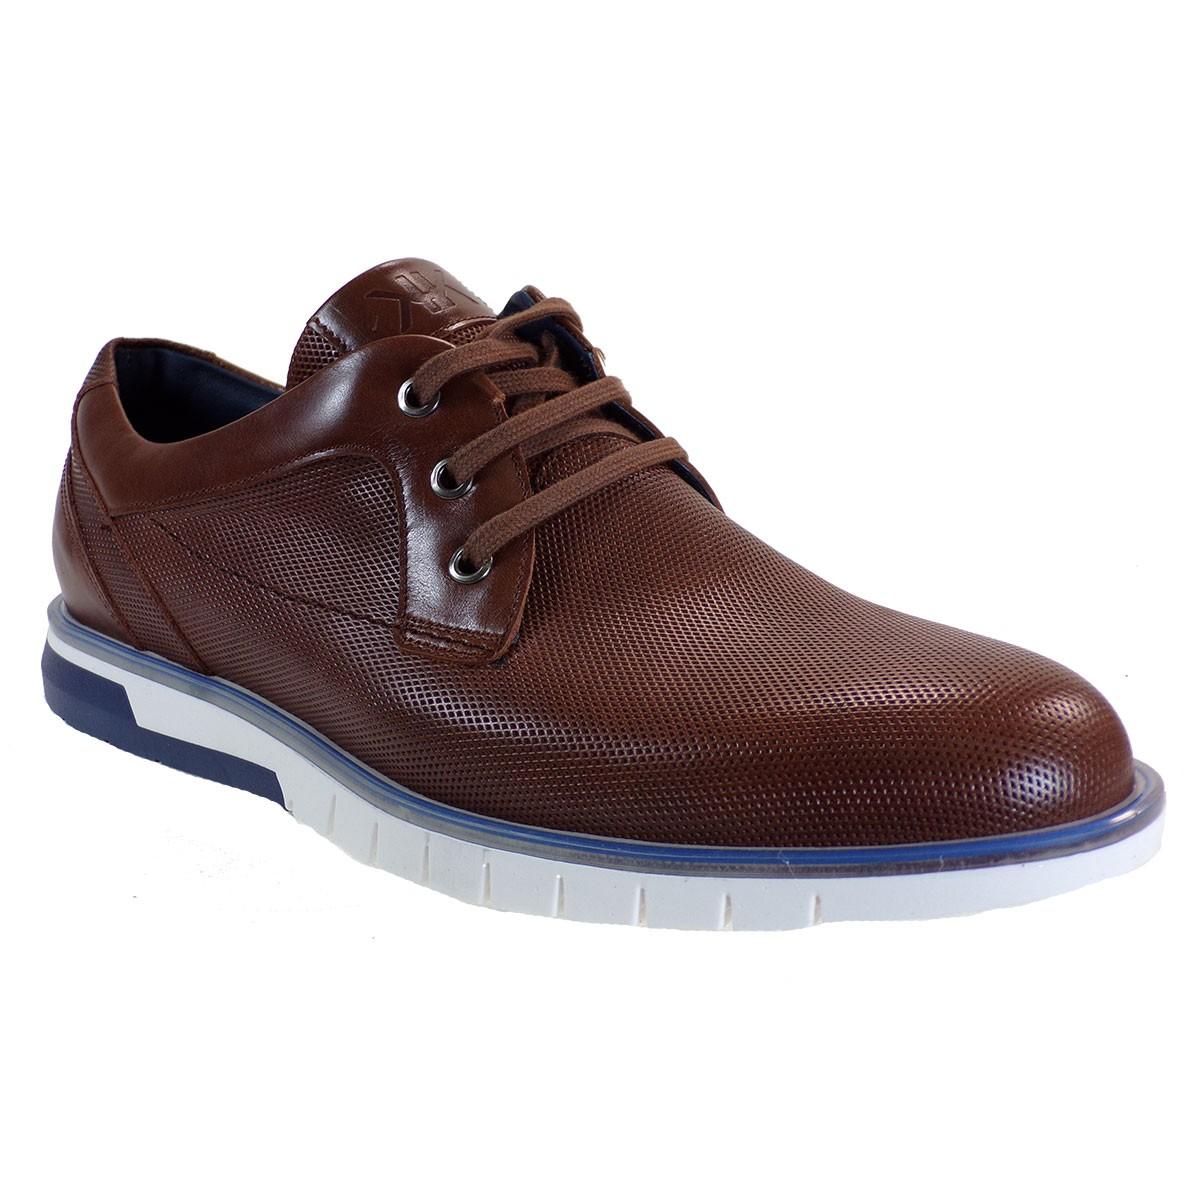 kricket Ανδρικά Παπούτσια K8 Ταμπά Δέρμα